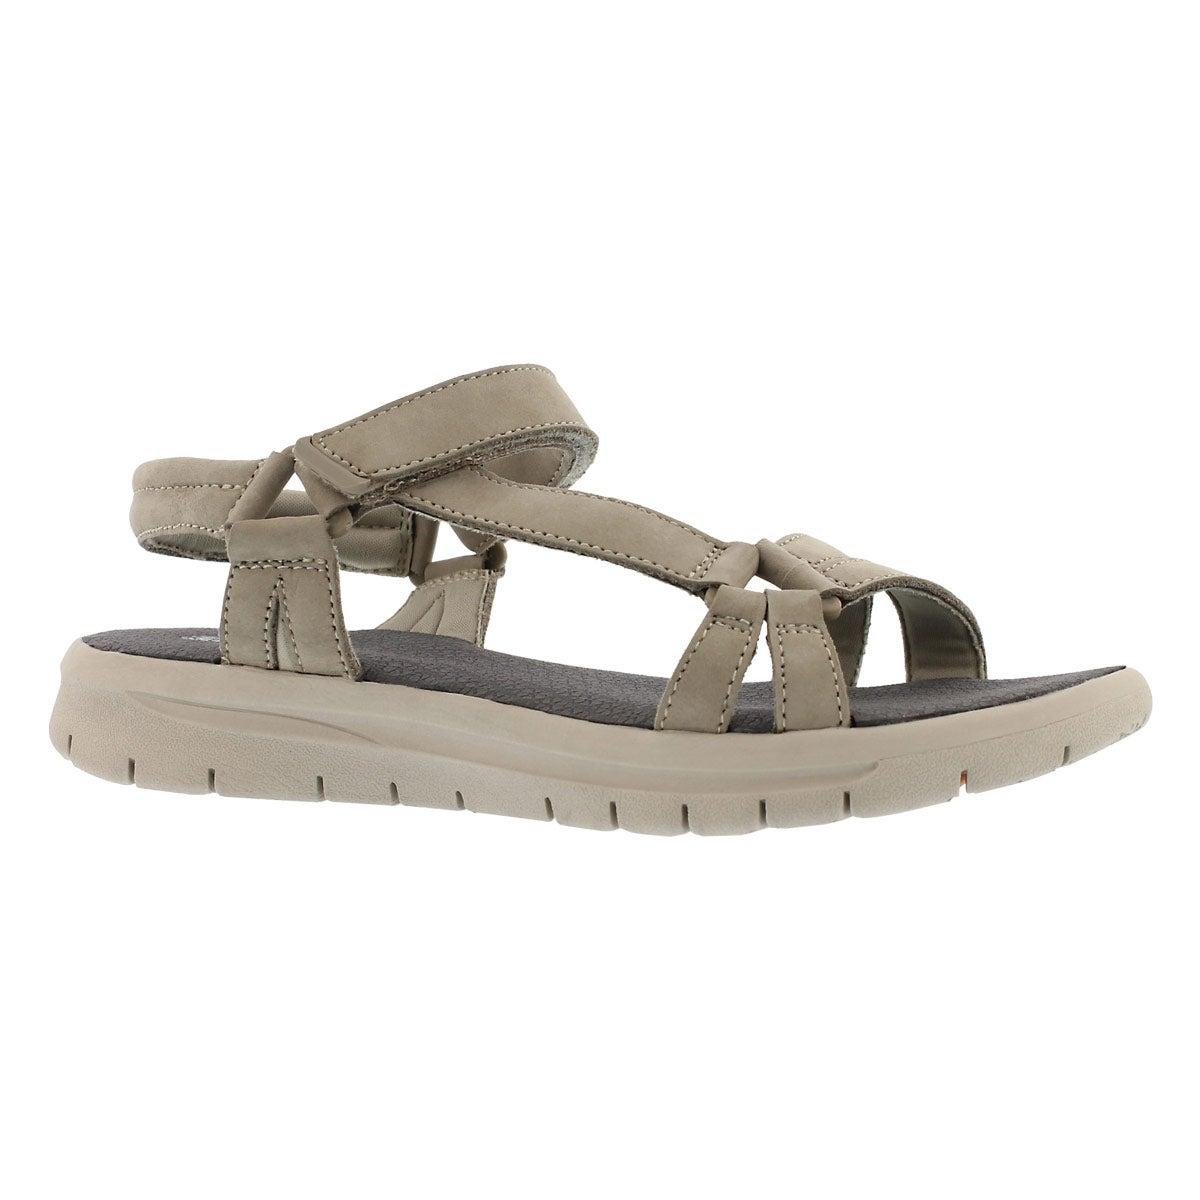 Women's CHRISSY stone sport sandals